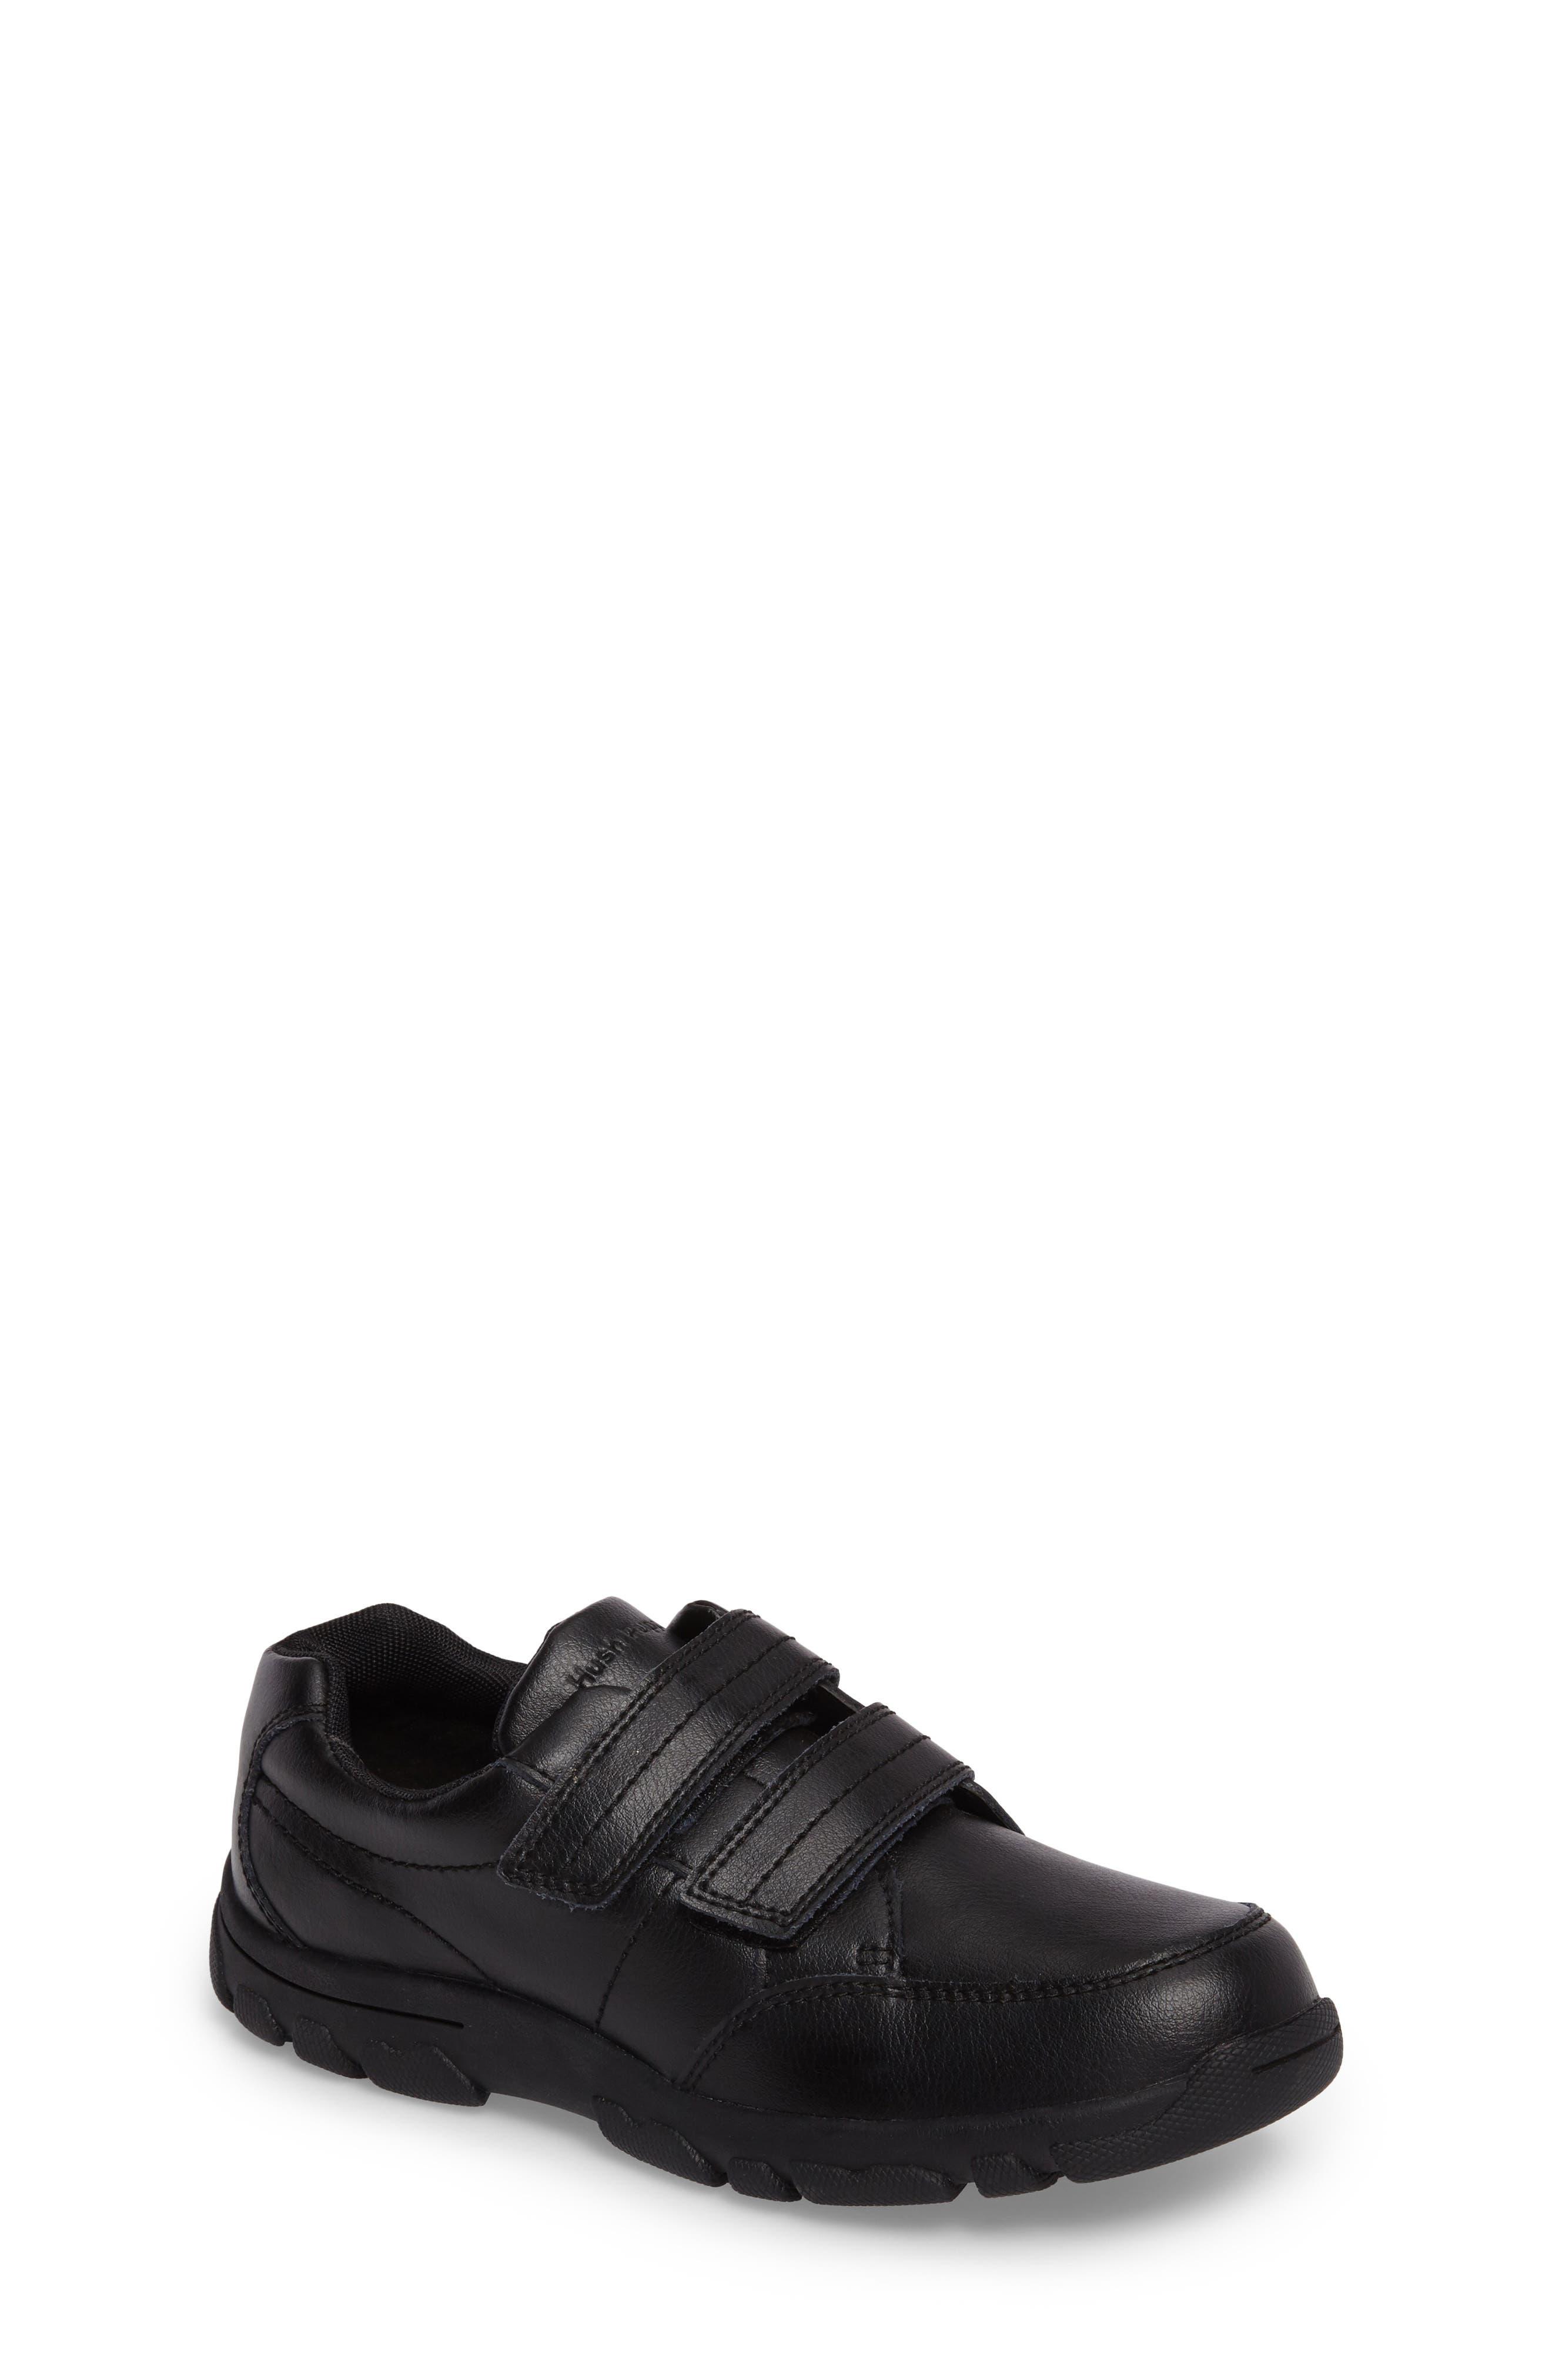 Jace Dress Sneaker,                         Main,                         color, BLACK LEATHER